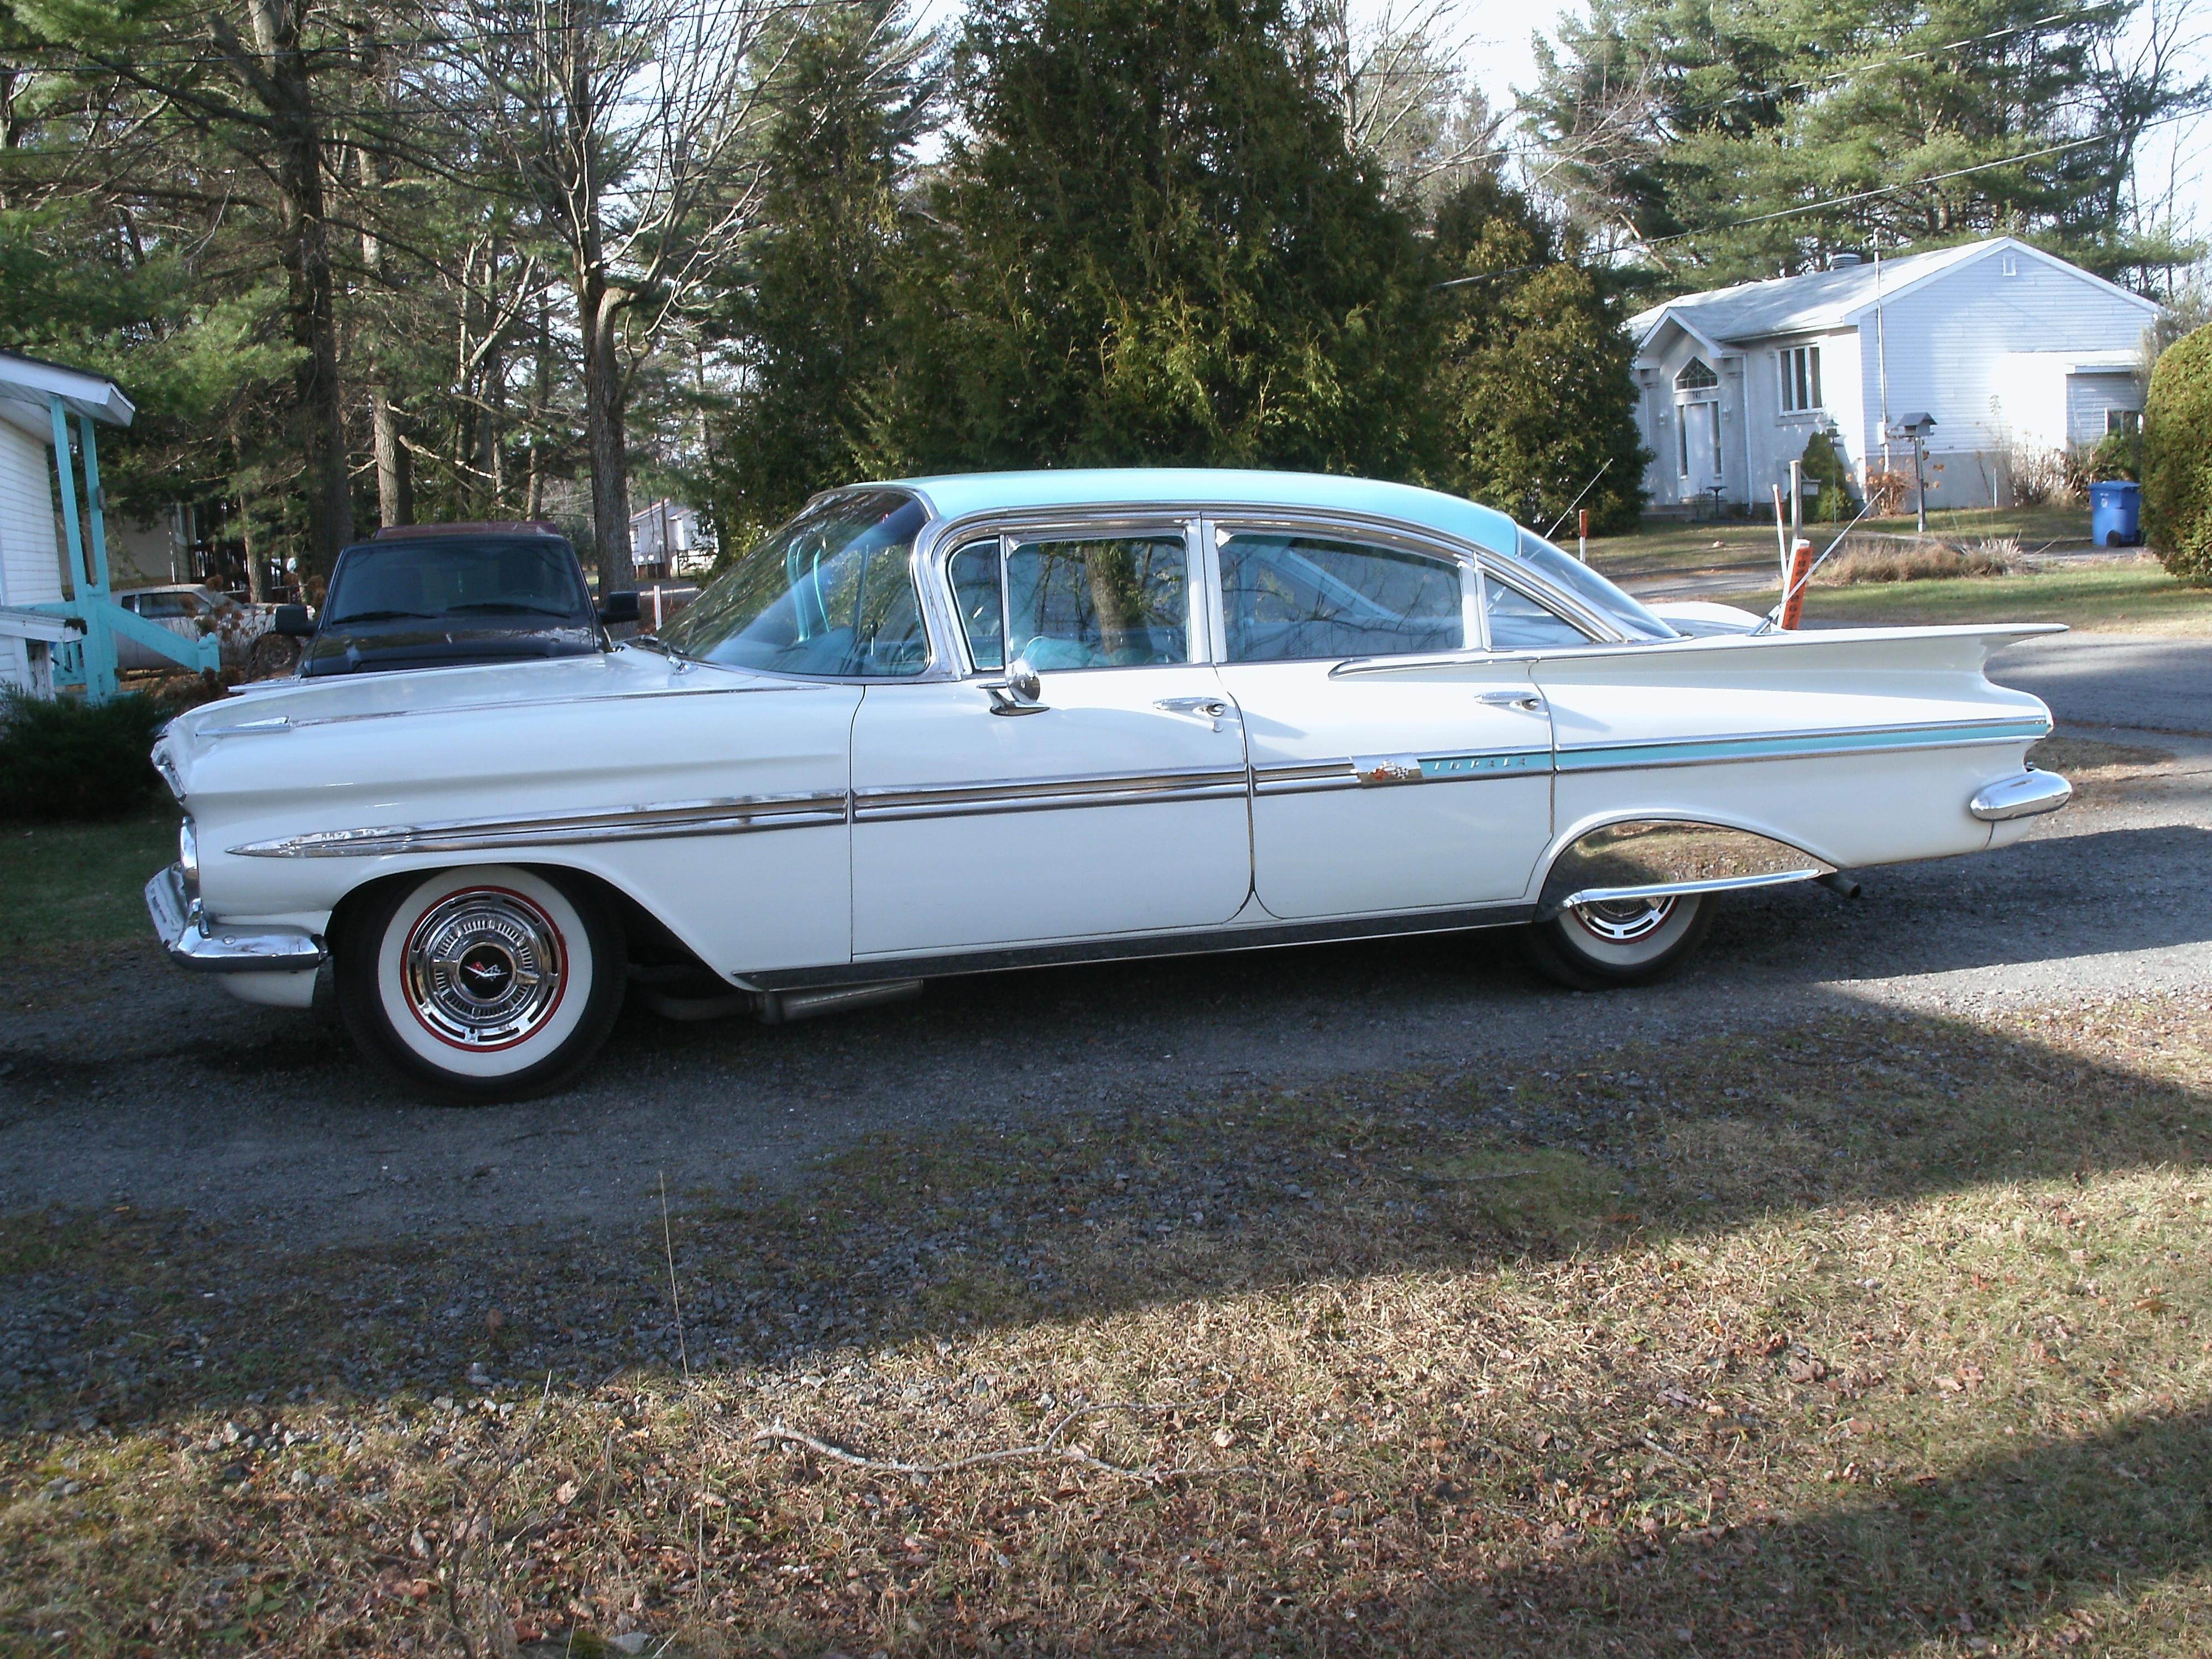 chevrolet impala 1959 a vendre 305553chevroletimpala1959003